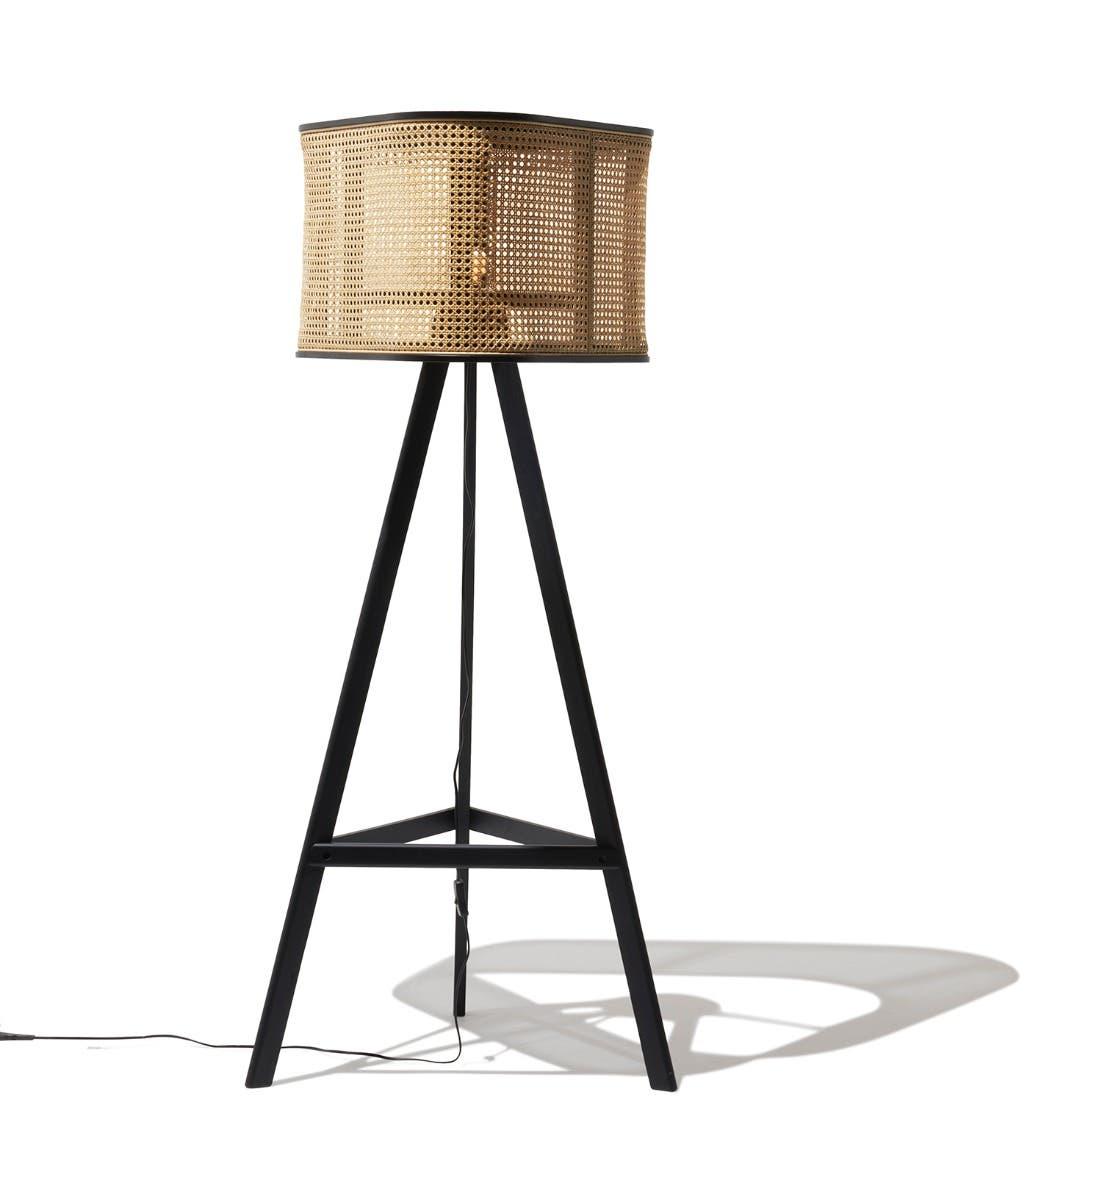 Industry West Cane Floor Lamp Black